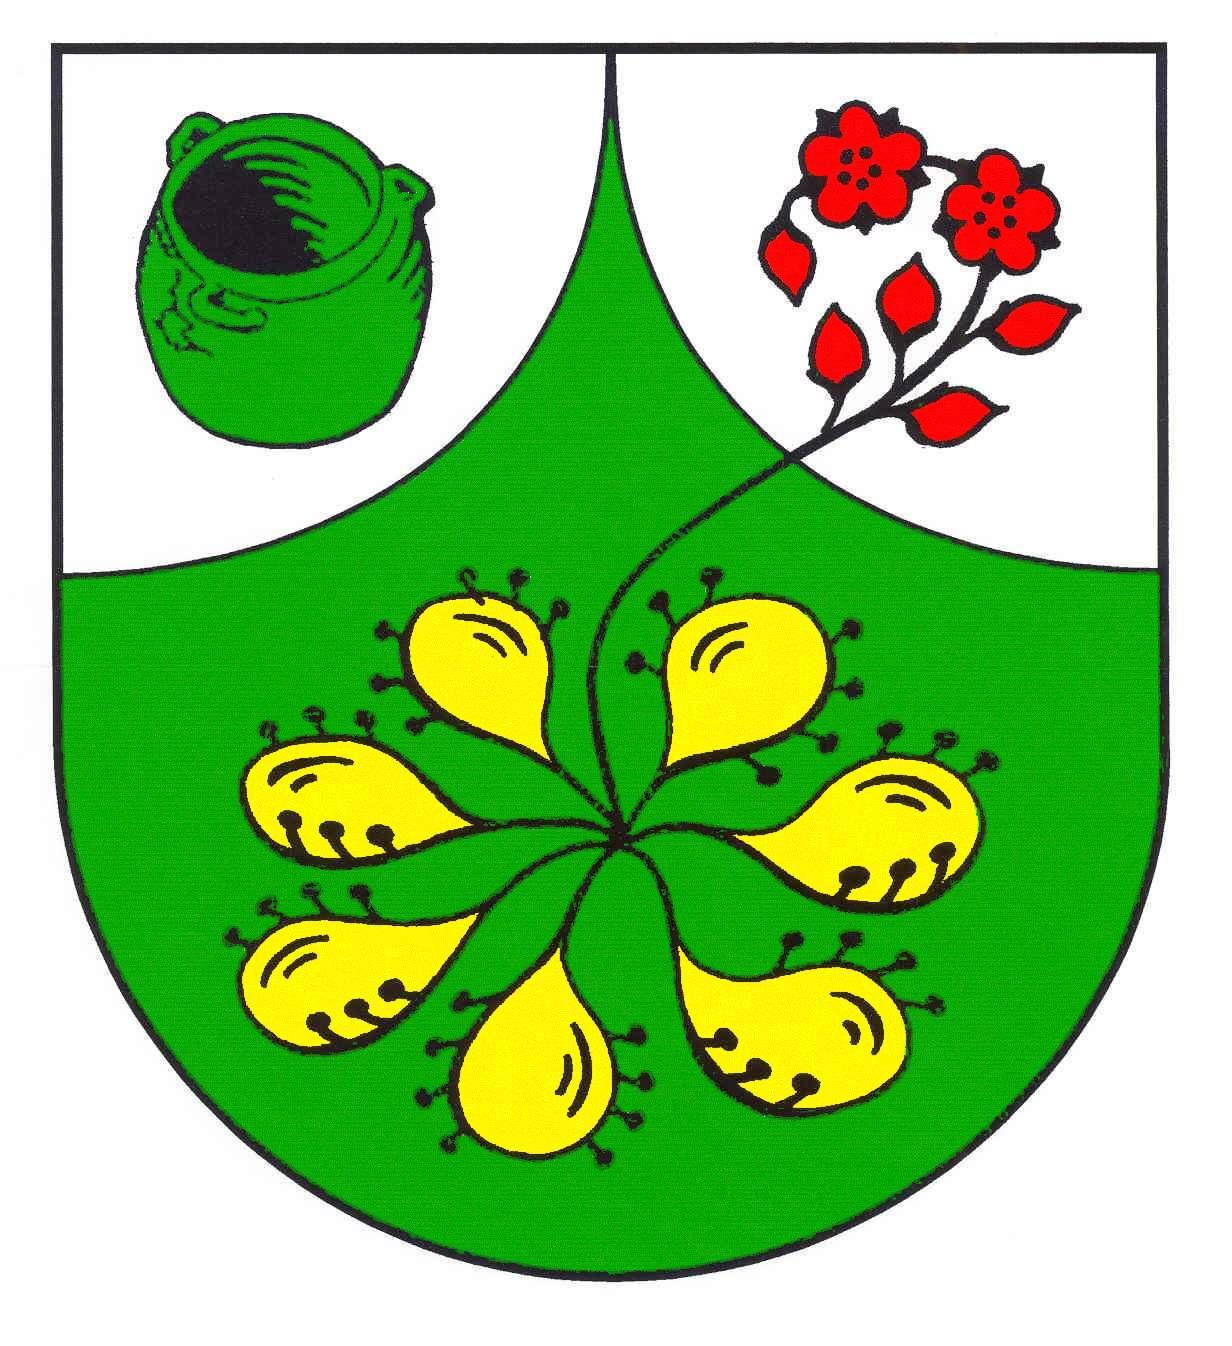 Wappen GemeindeSeth, Kreis Segeberg